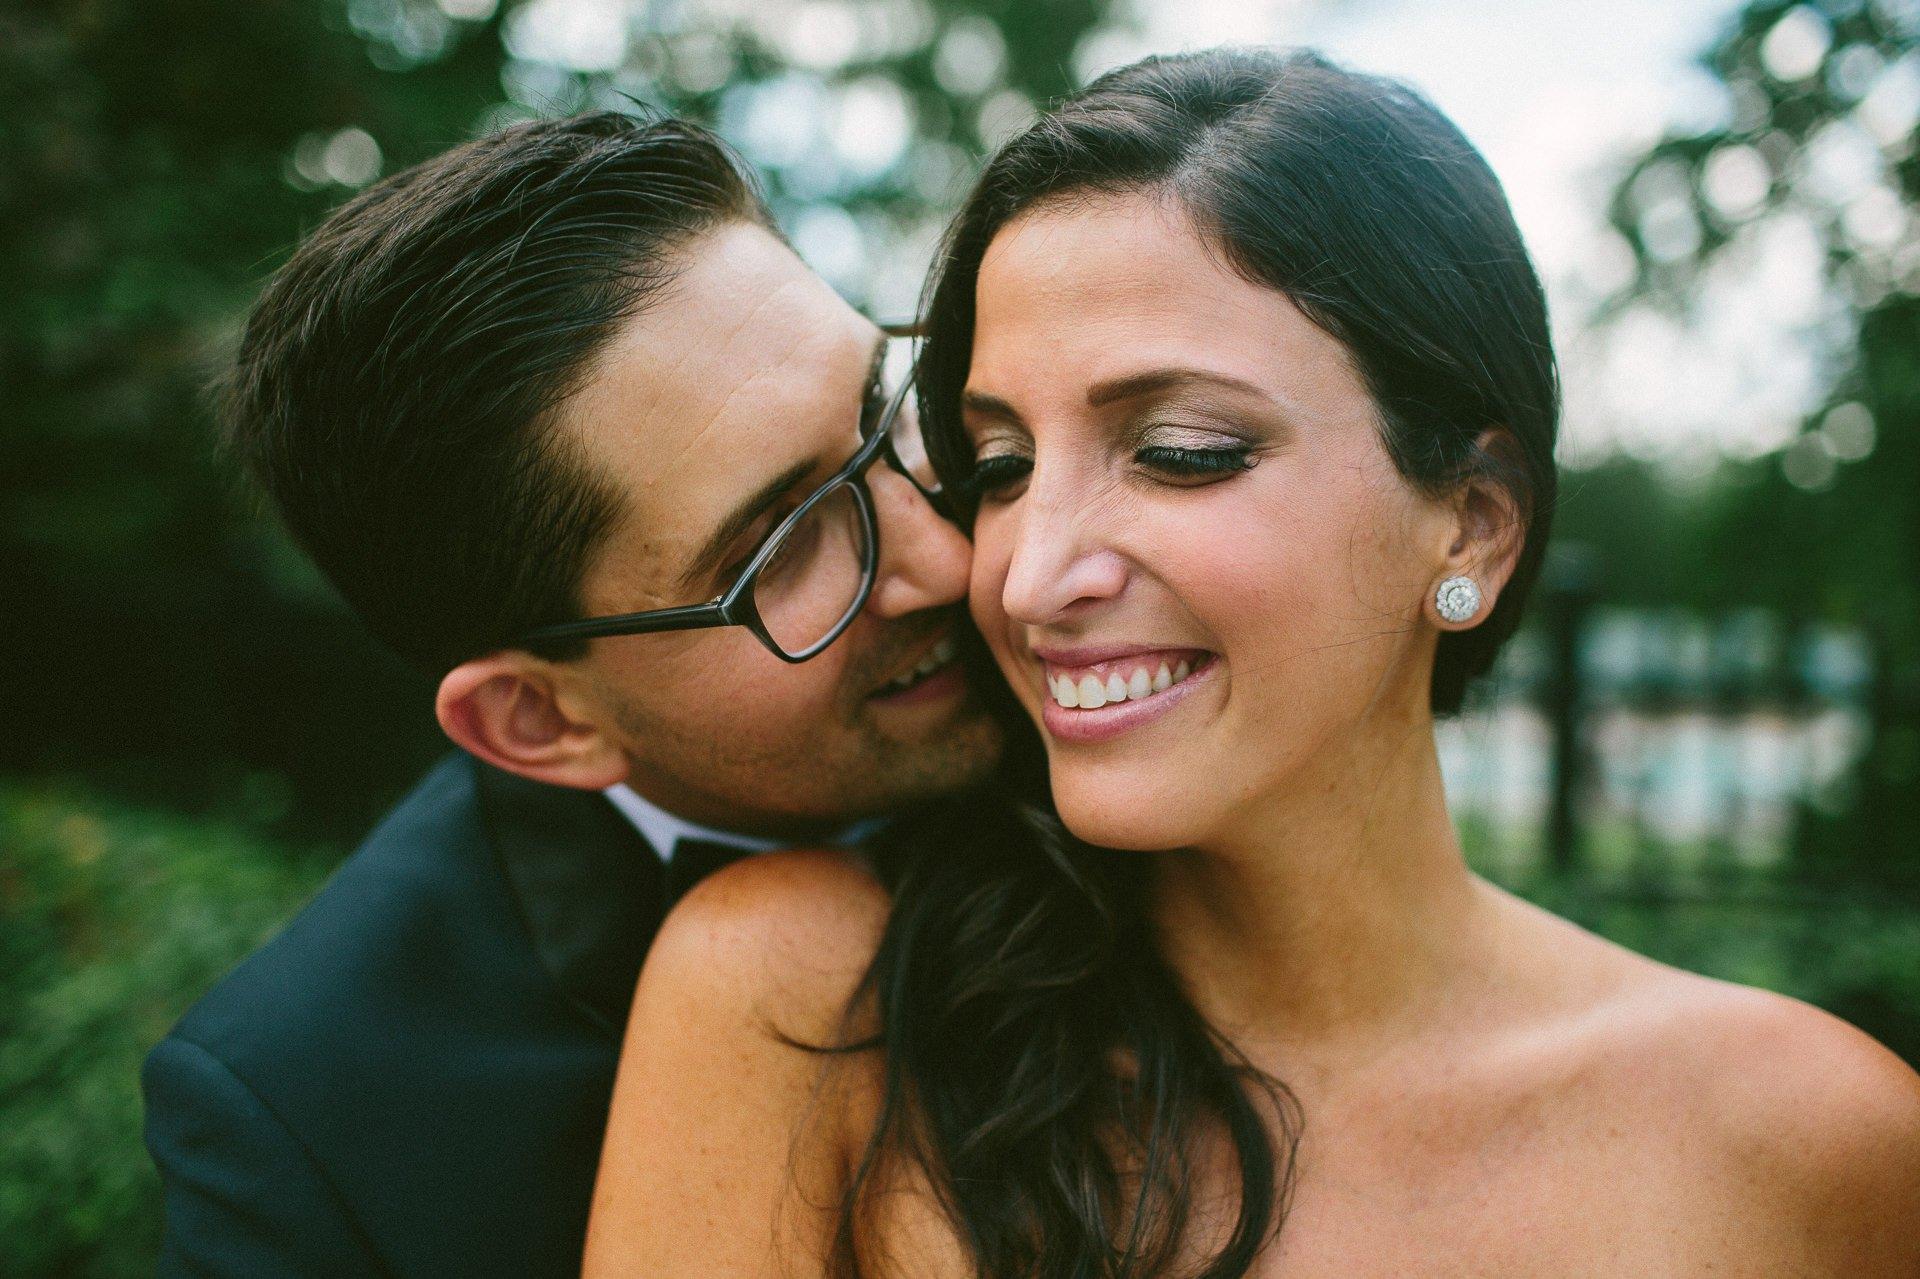 Beechmont Country Club Wedding Photographer in Beachwood 1 30.jpg